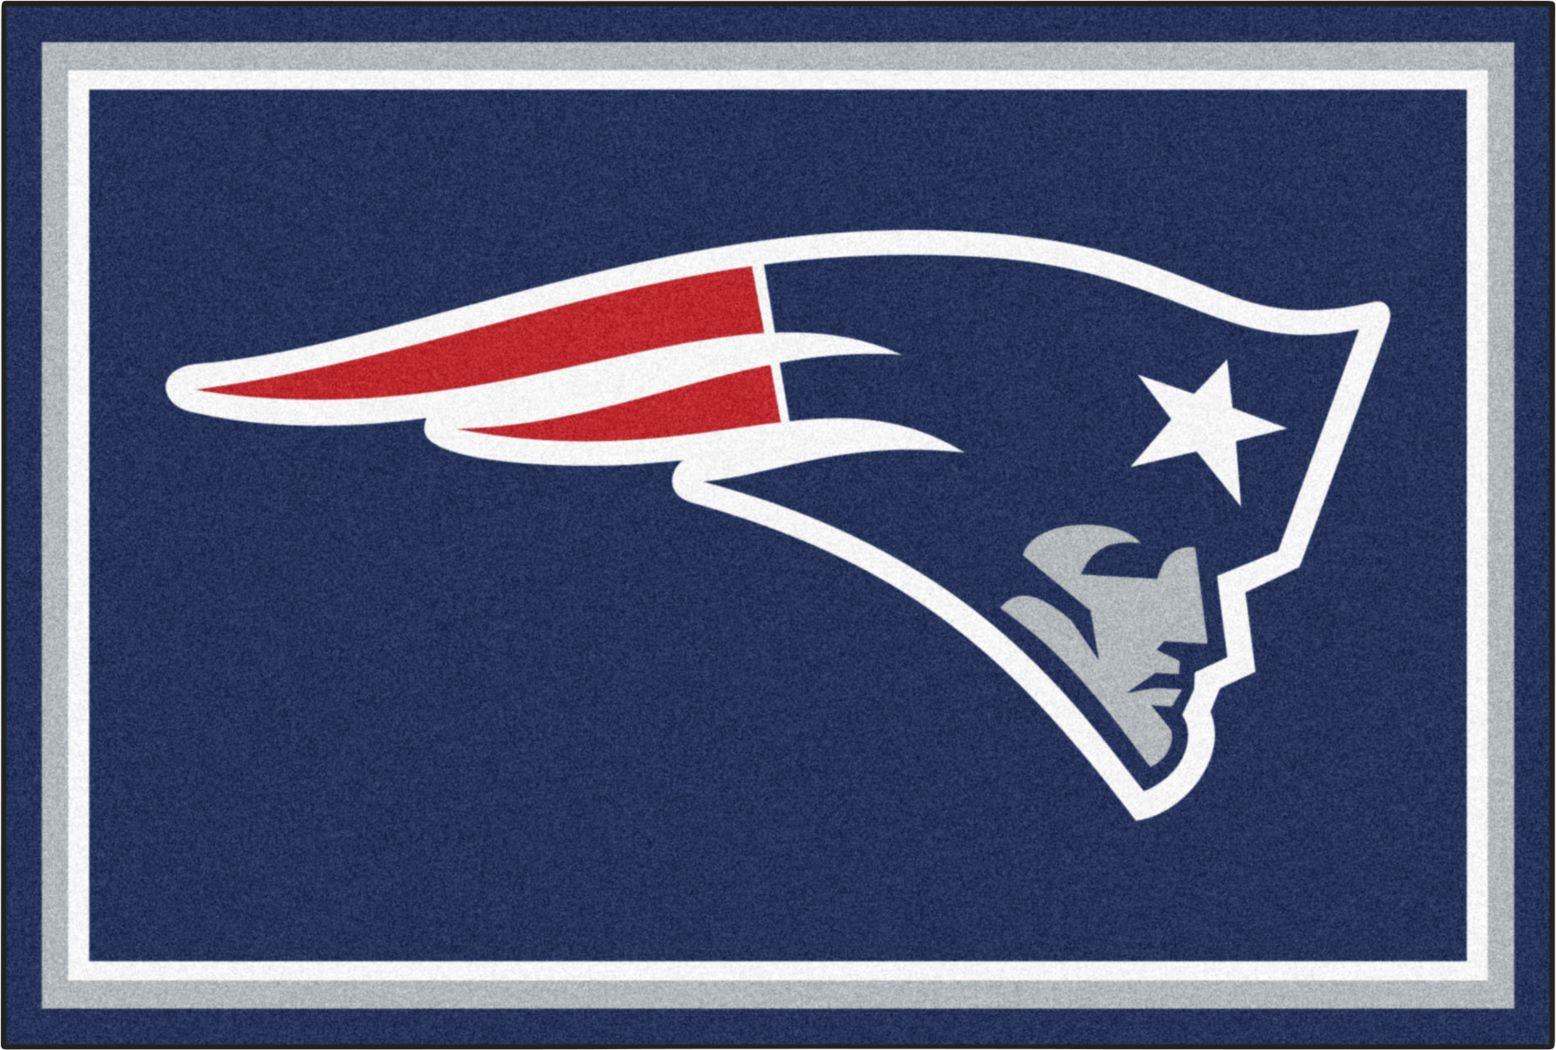 NFL Big Game New England Patriots 5' x 8' Rug